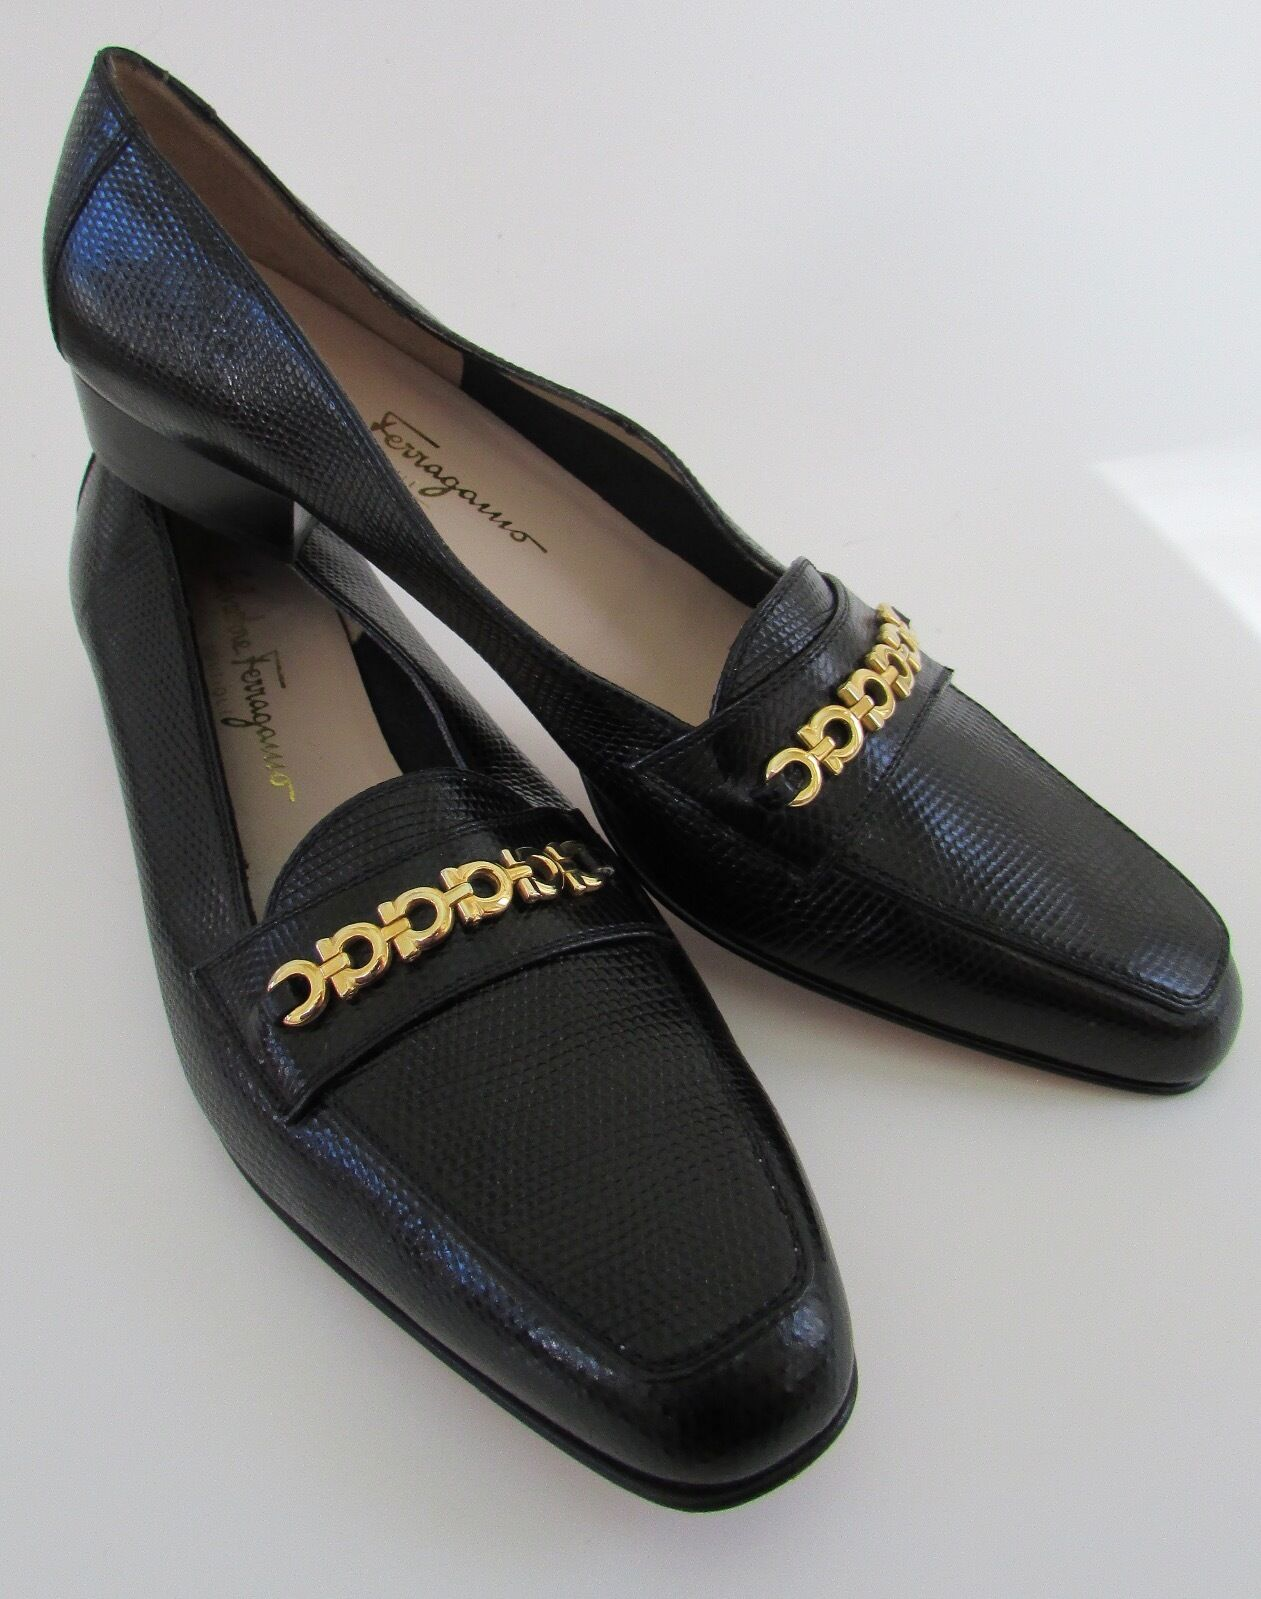 Salvatore Farragamo Italy Women's Black Snakeskin/Horsebit Leather Loafers 9.5N